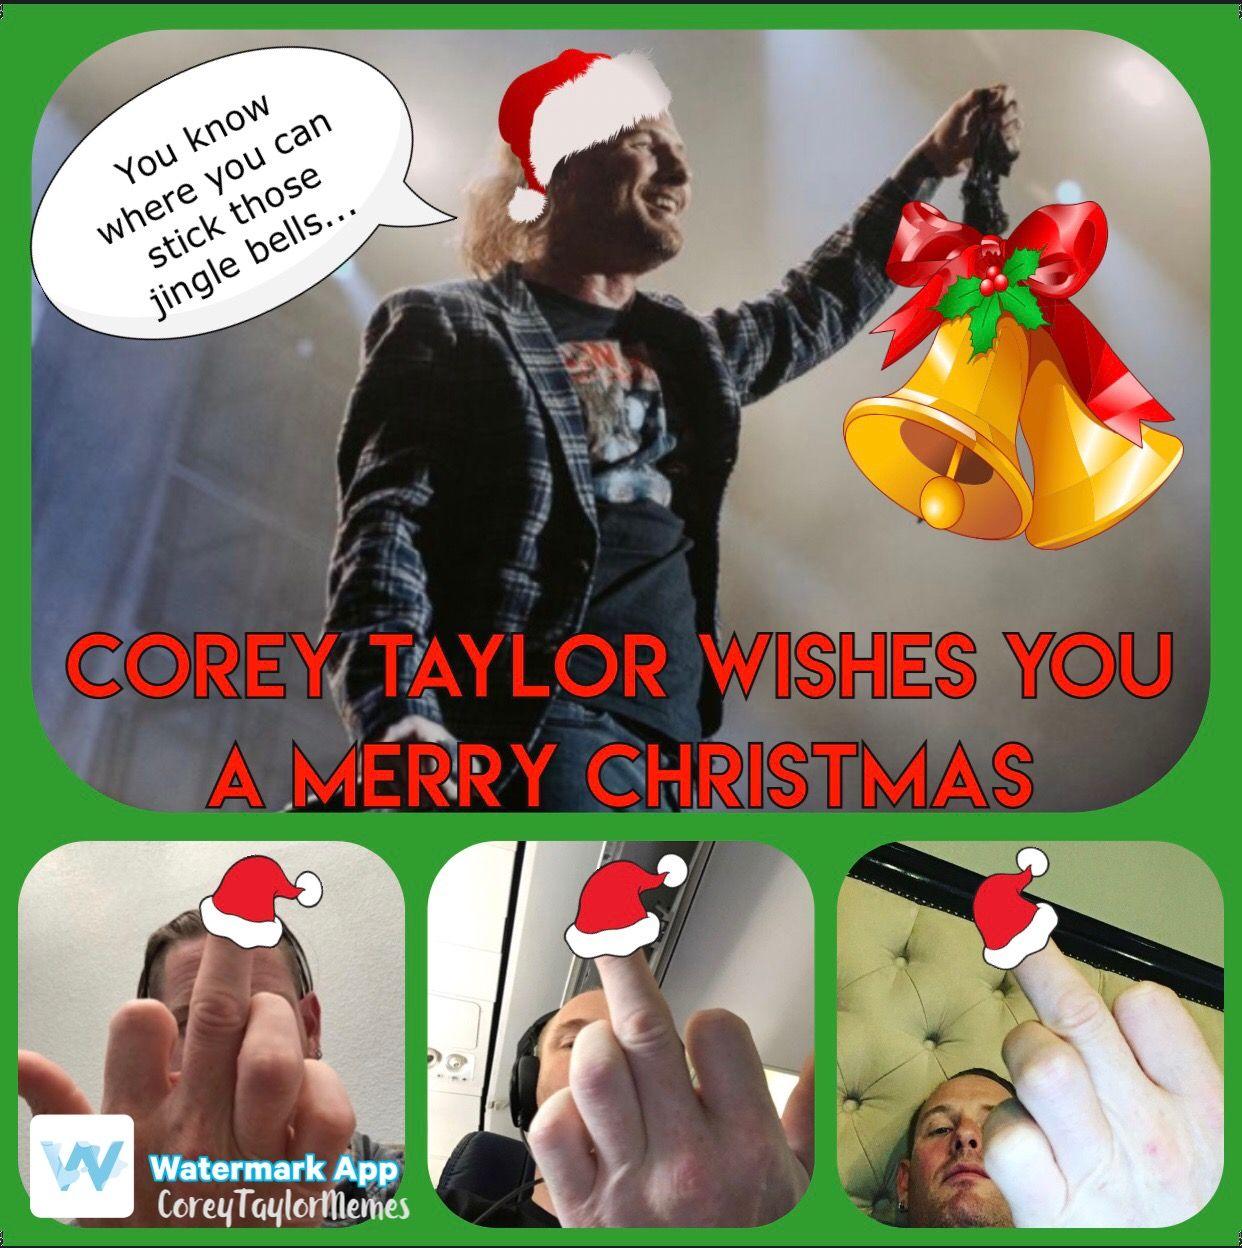 Bildergebnis für Corey taylor jingle bells